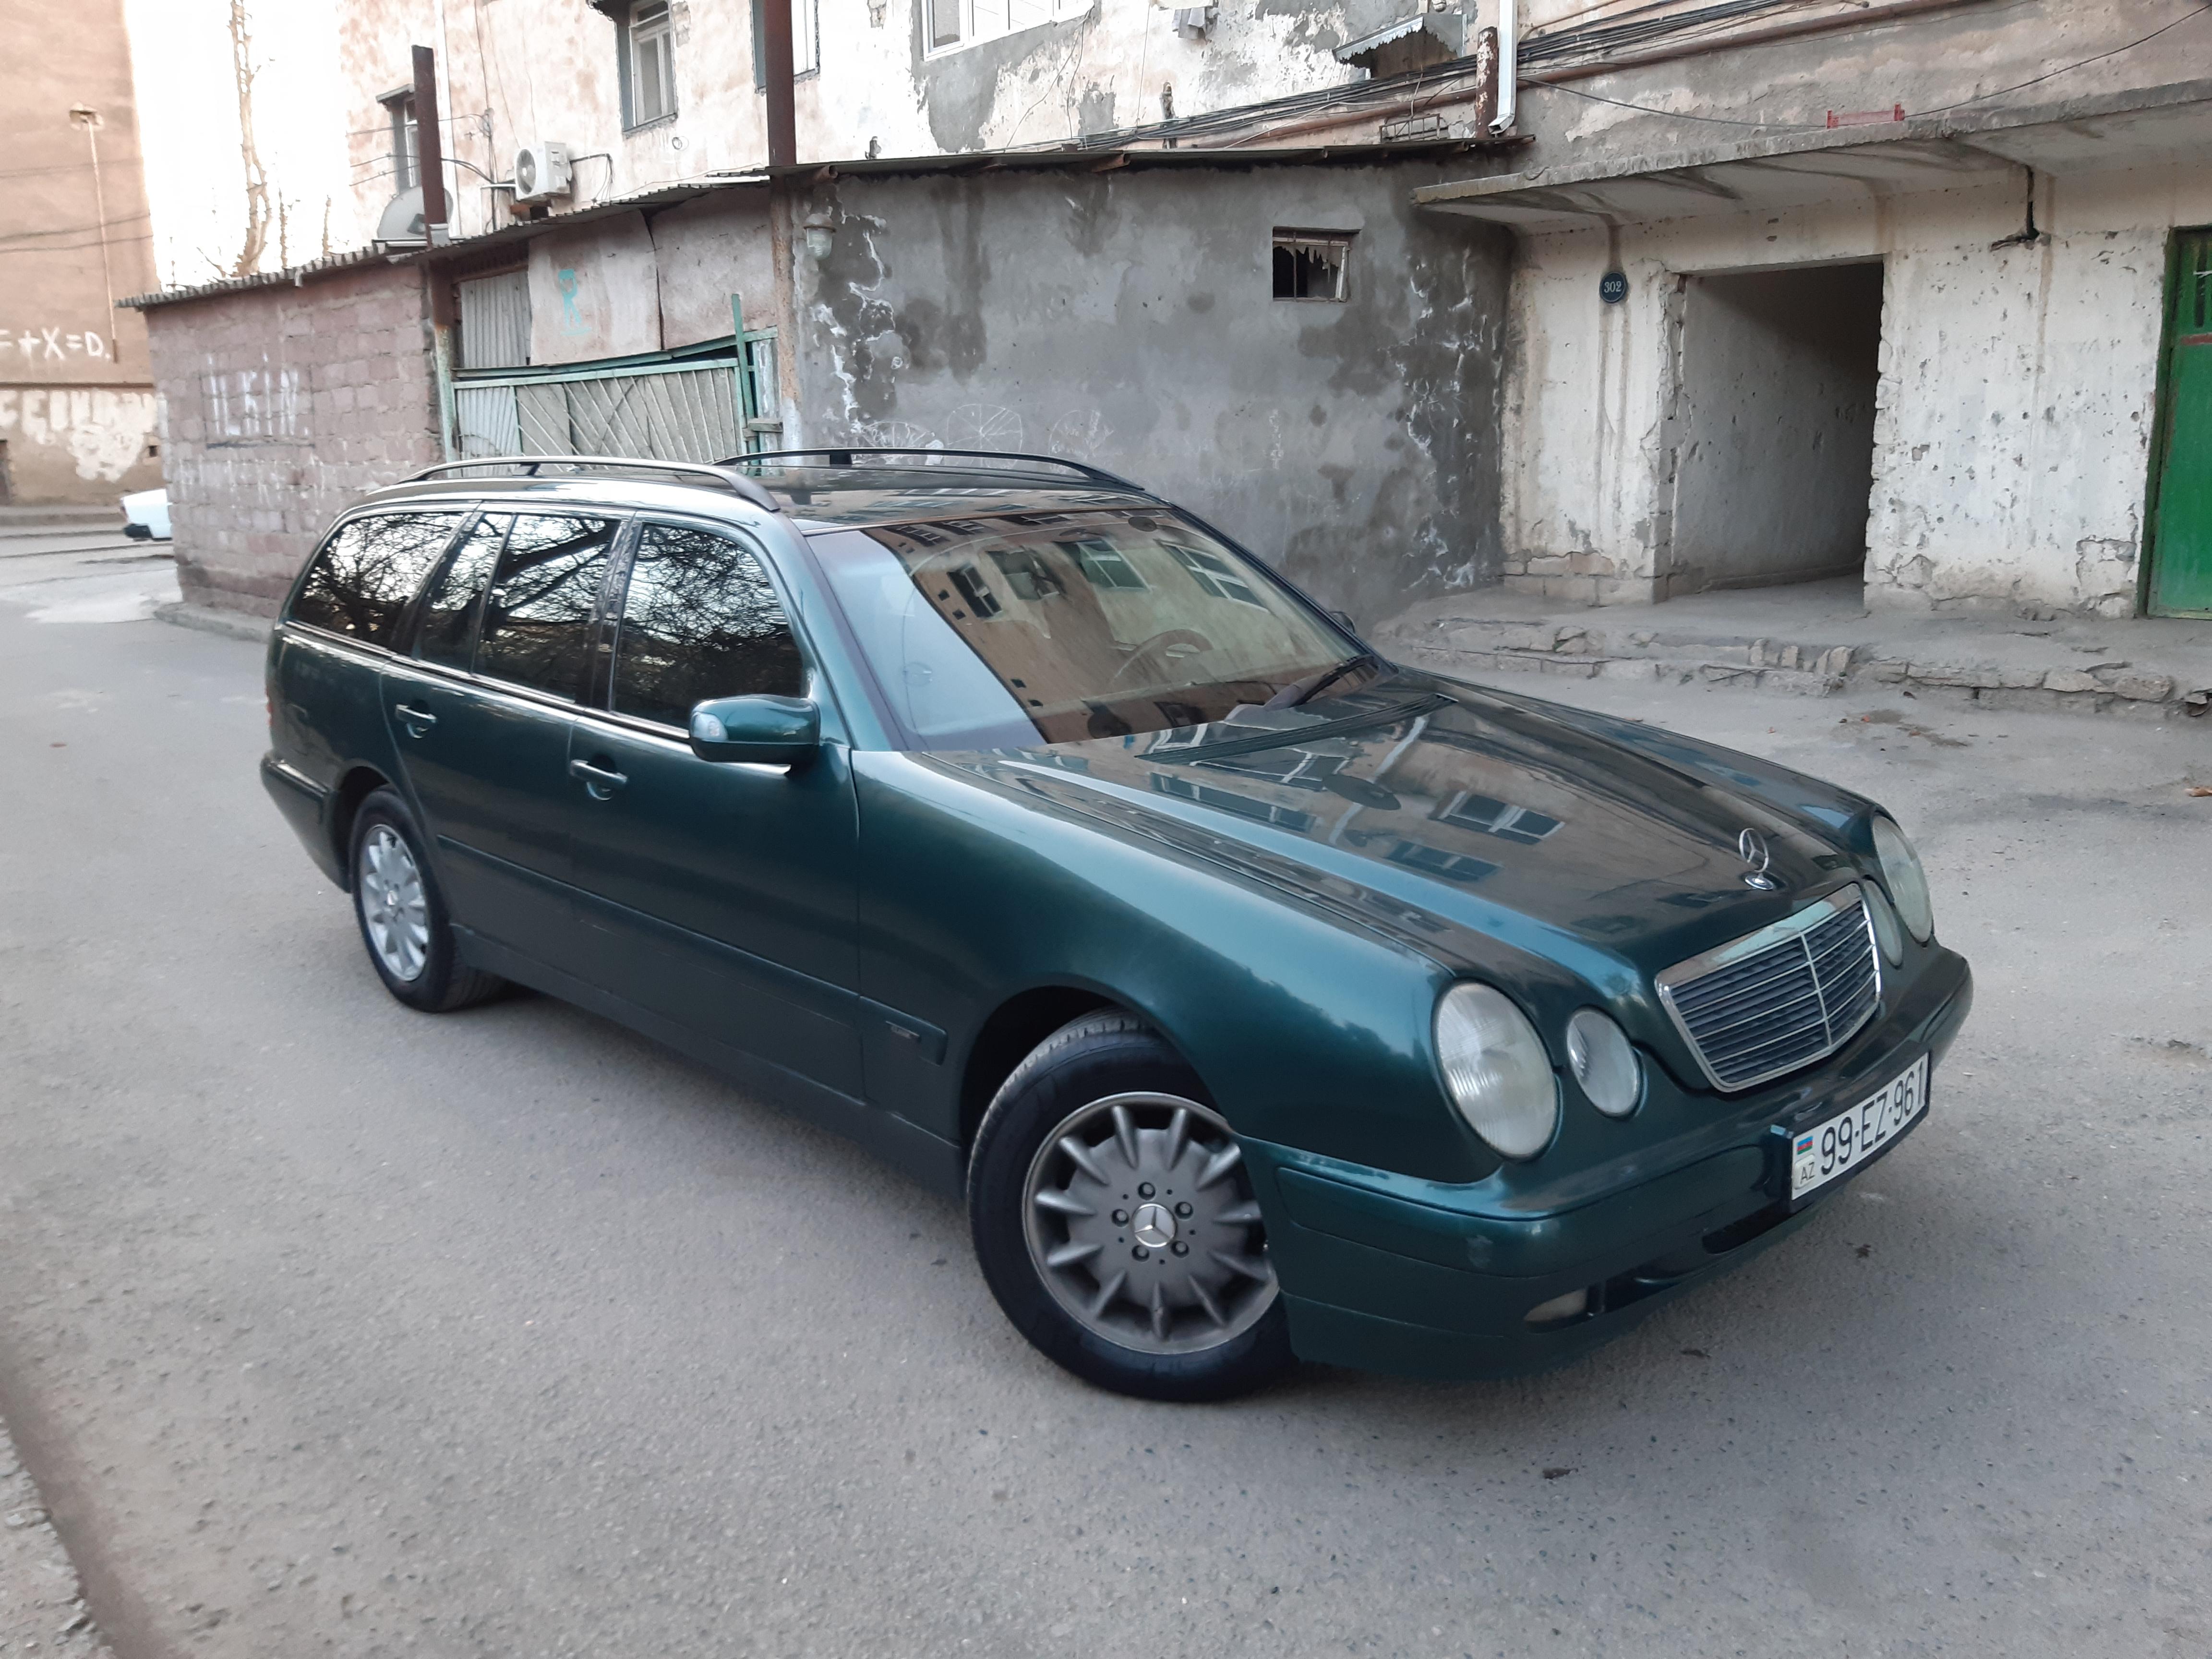 Mercedes-Benz E 220 2.2(lt) 2000 Подержанный  $8200